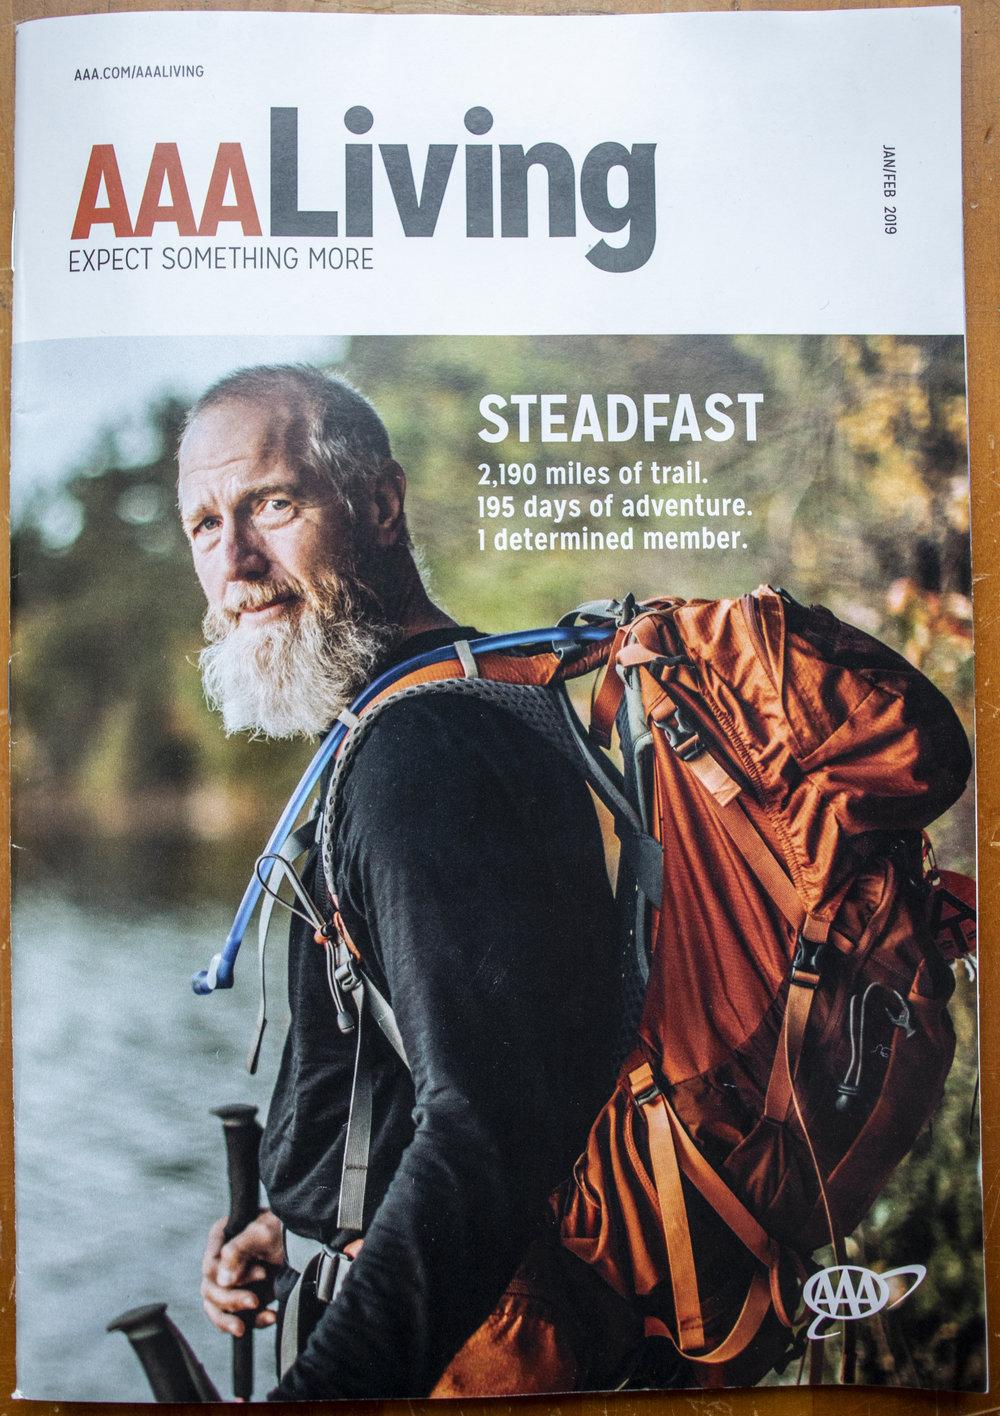 AAA Living, January/February 2019